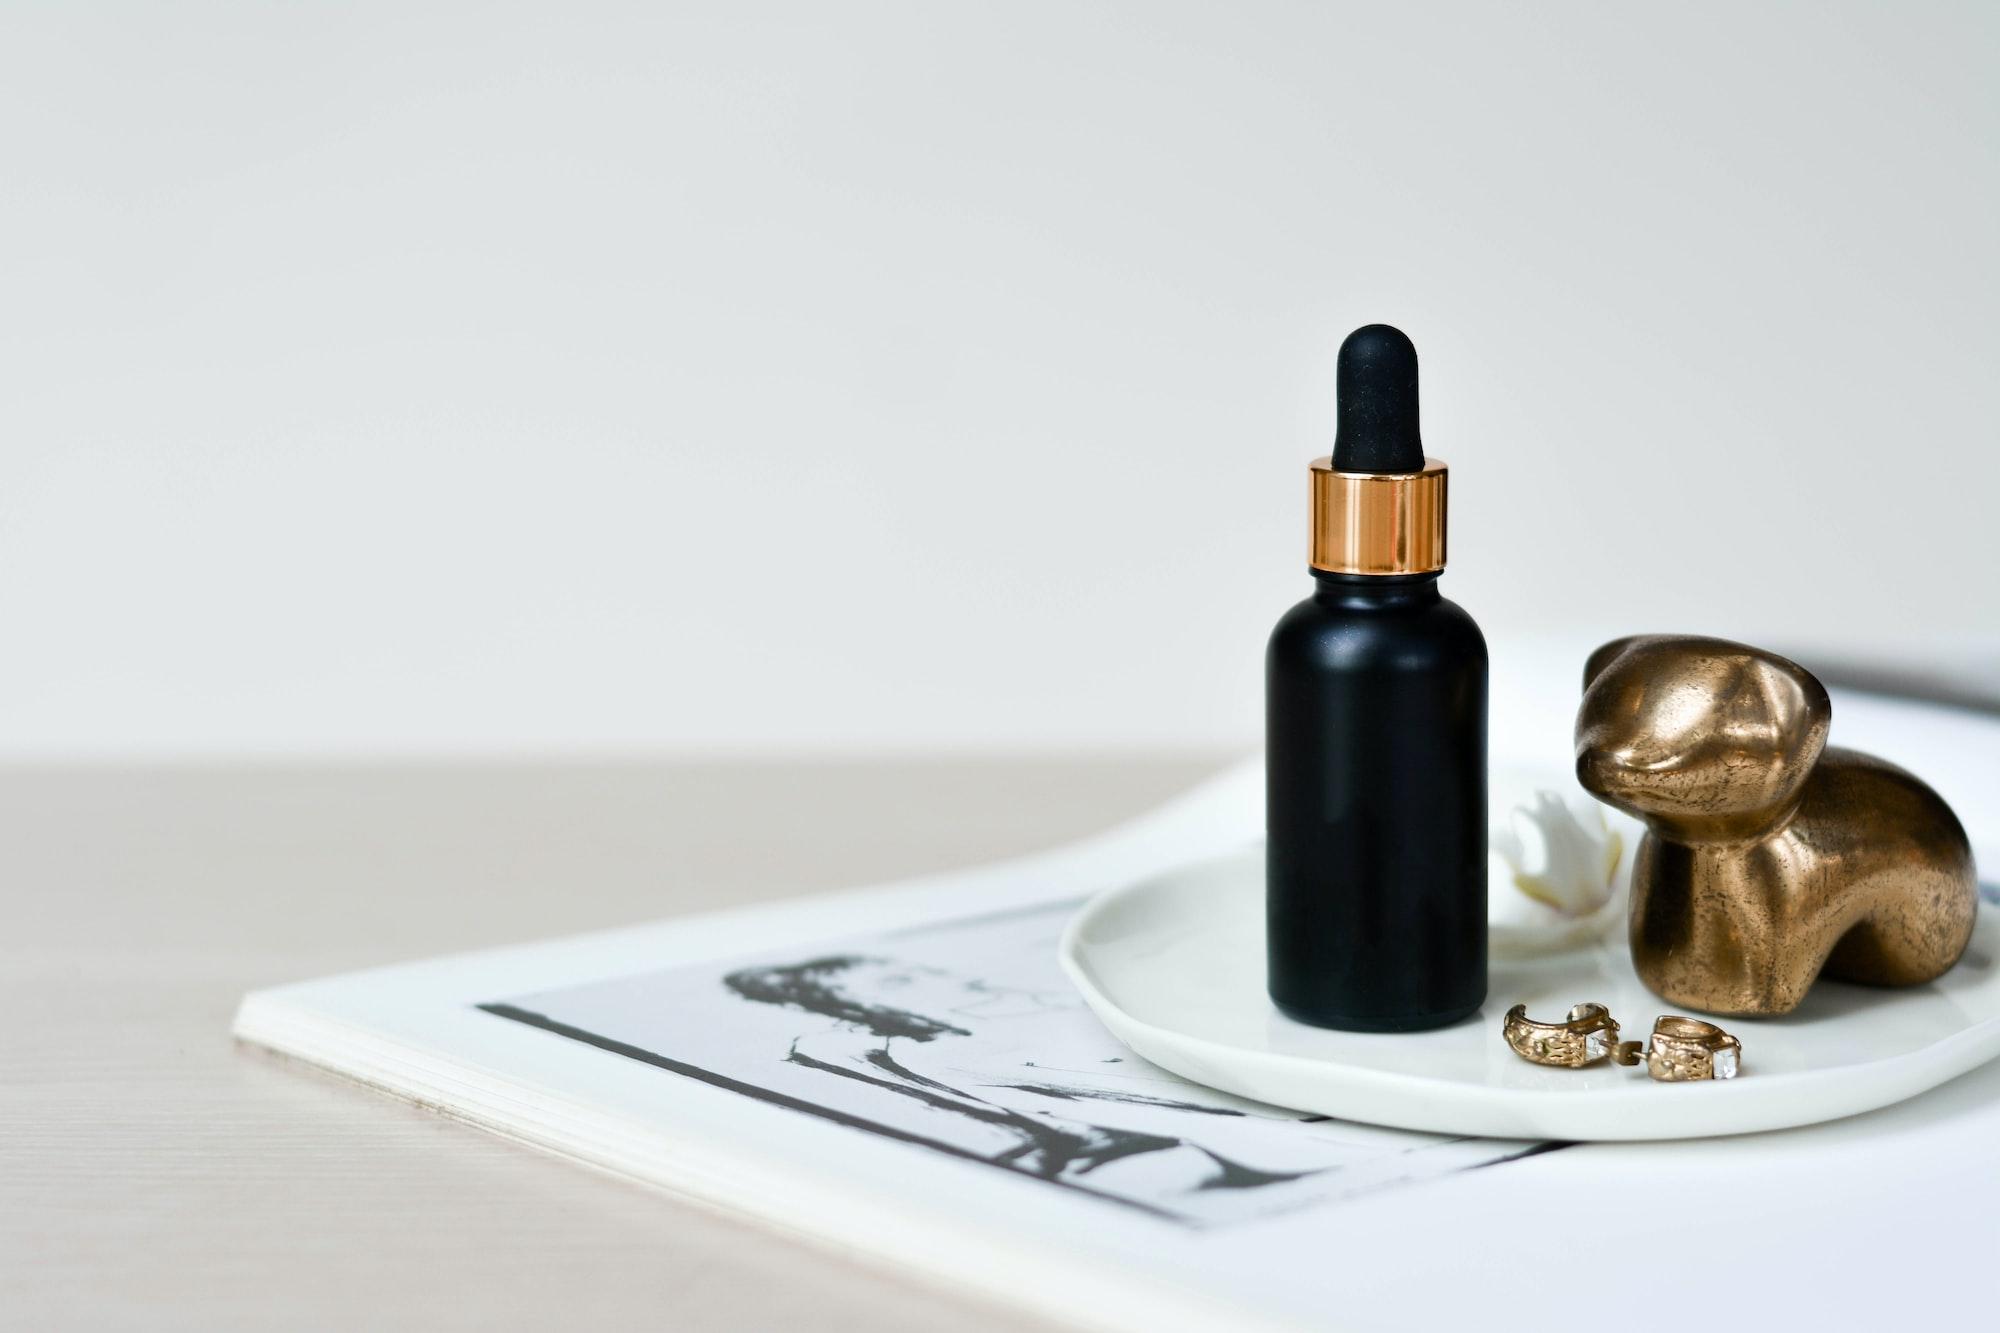 A black dropper bottle with gold details.